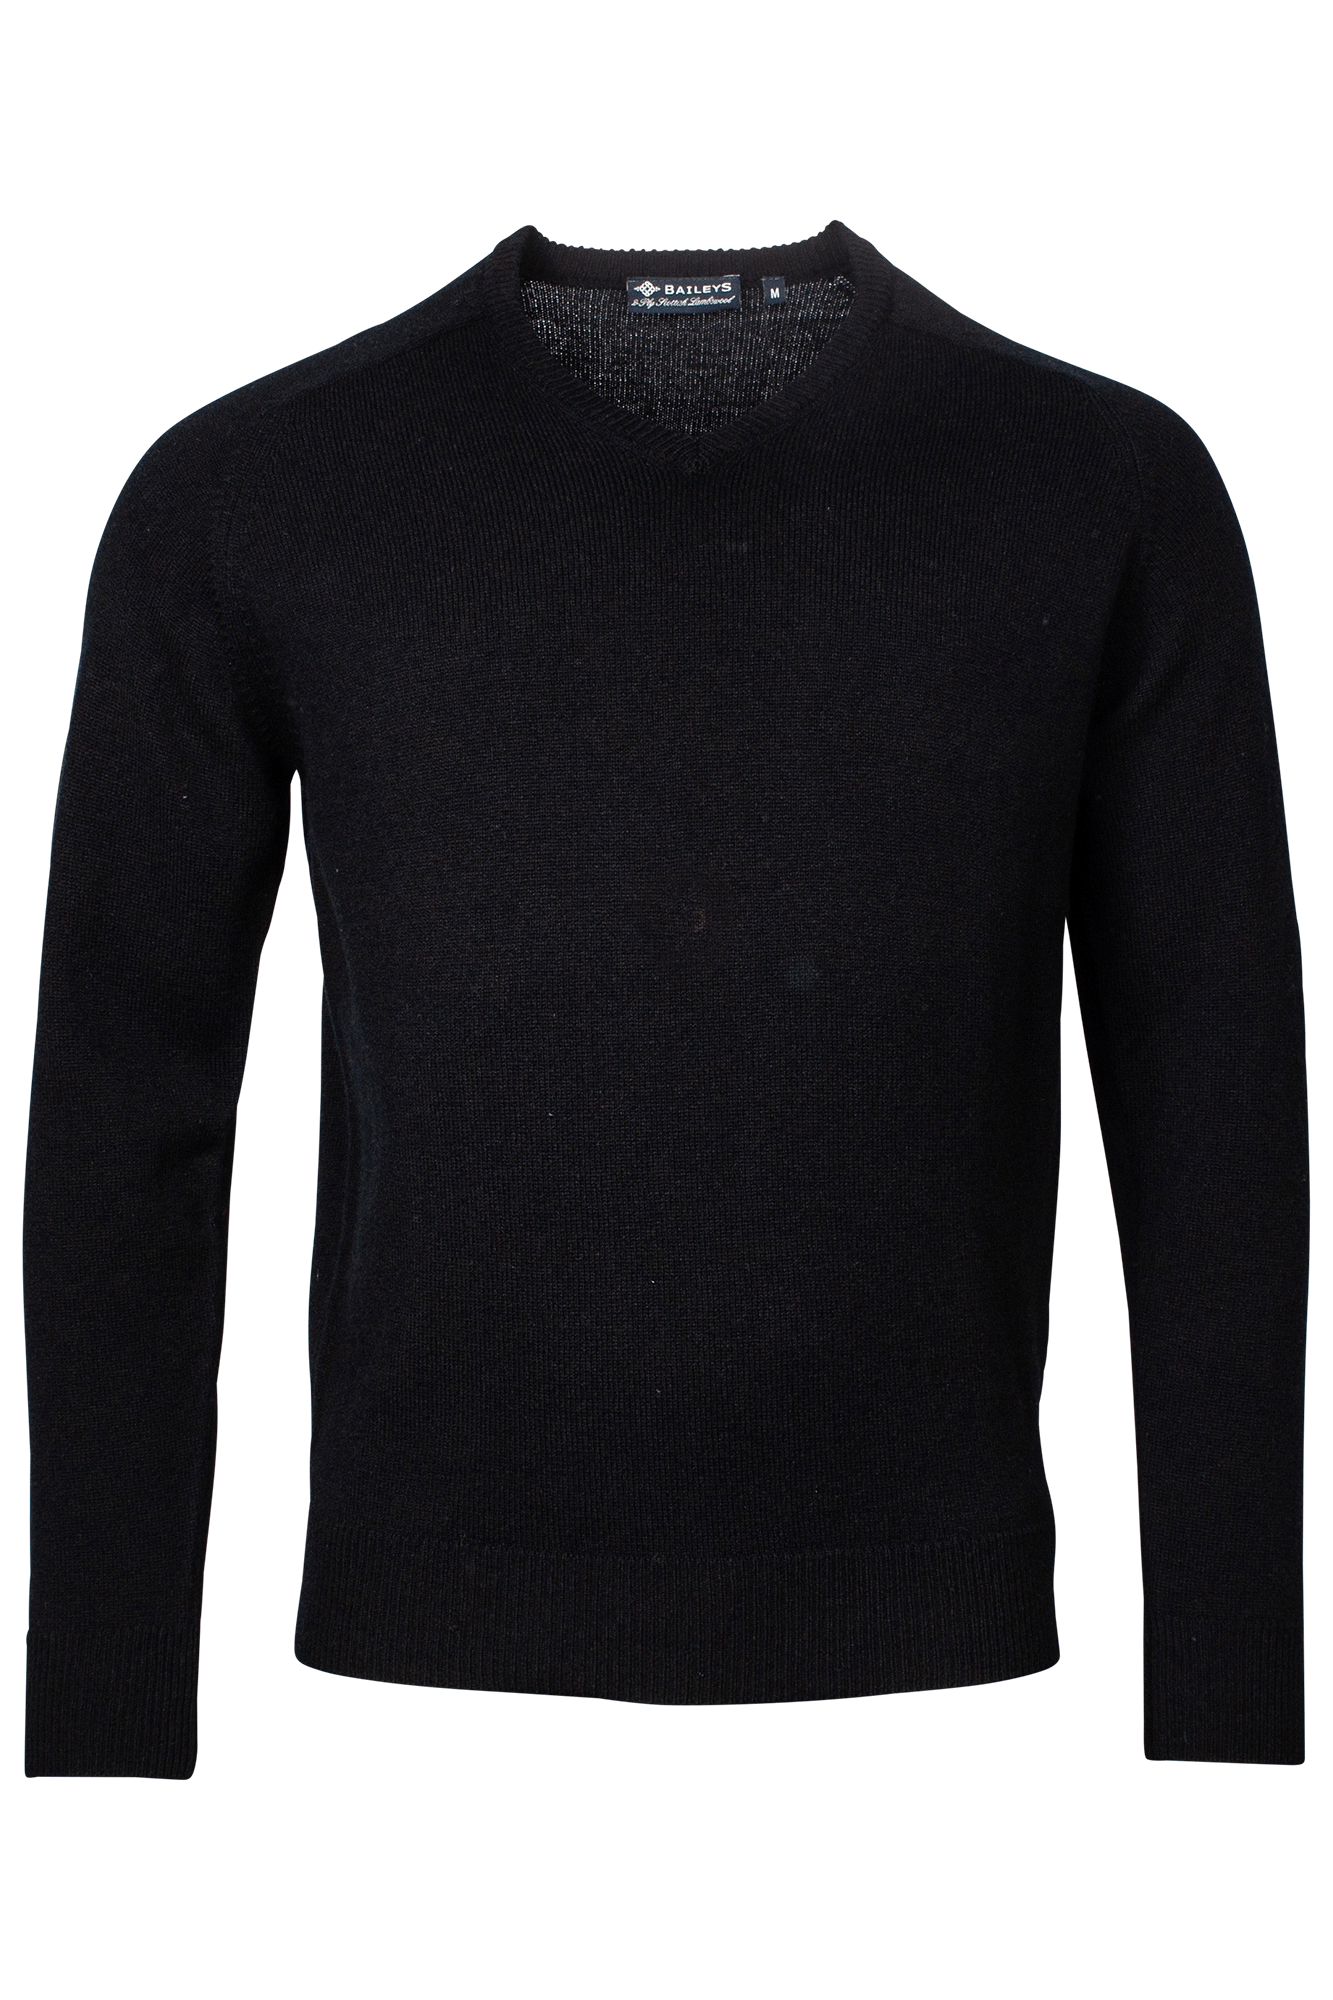 Baileys lamswollen pullover, v-hals, zwart